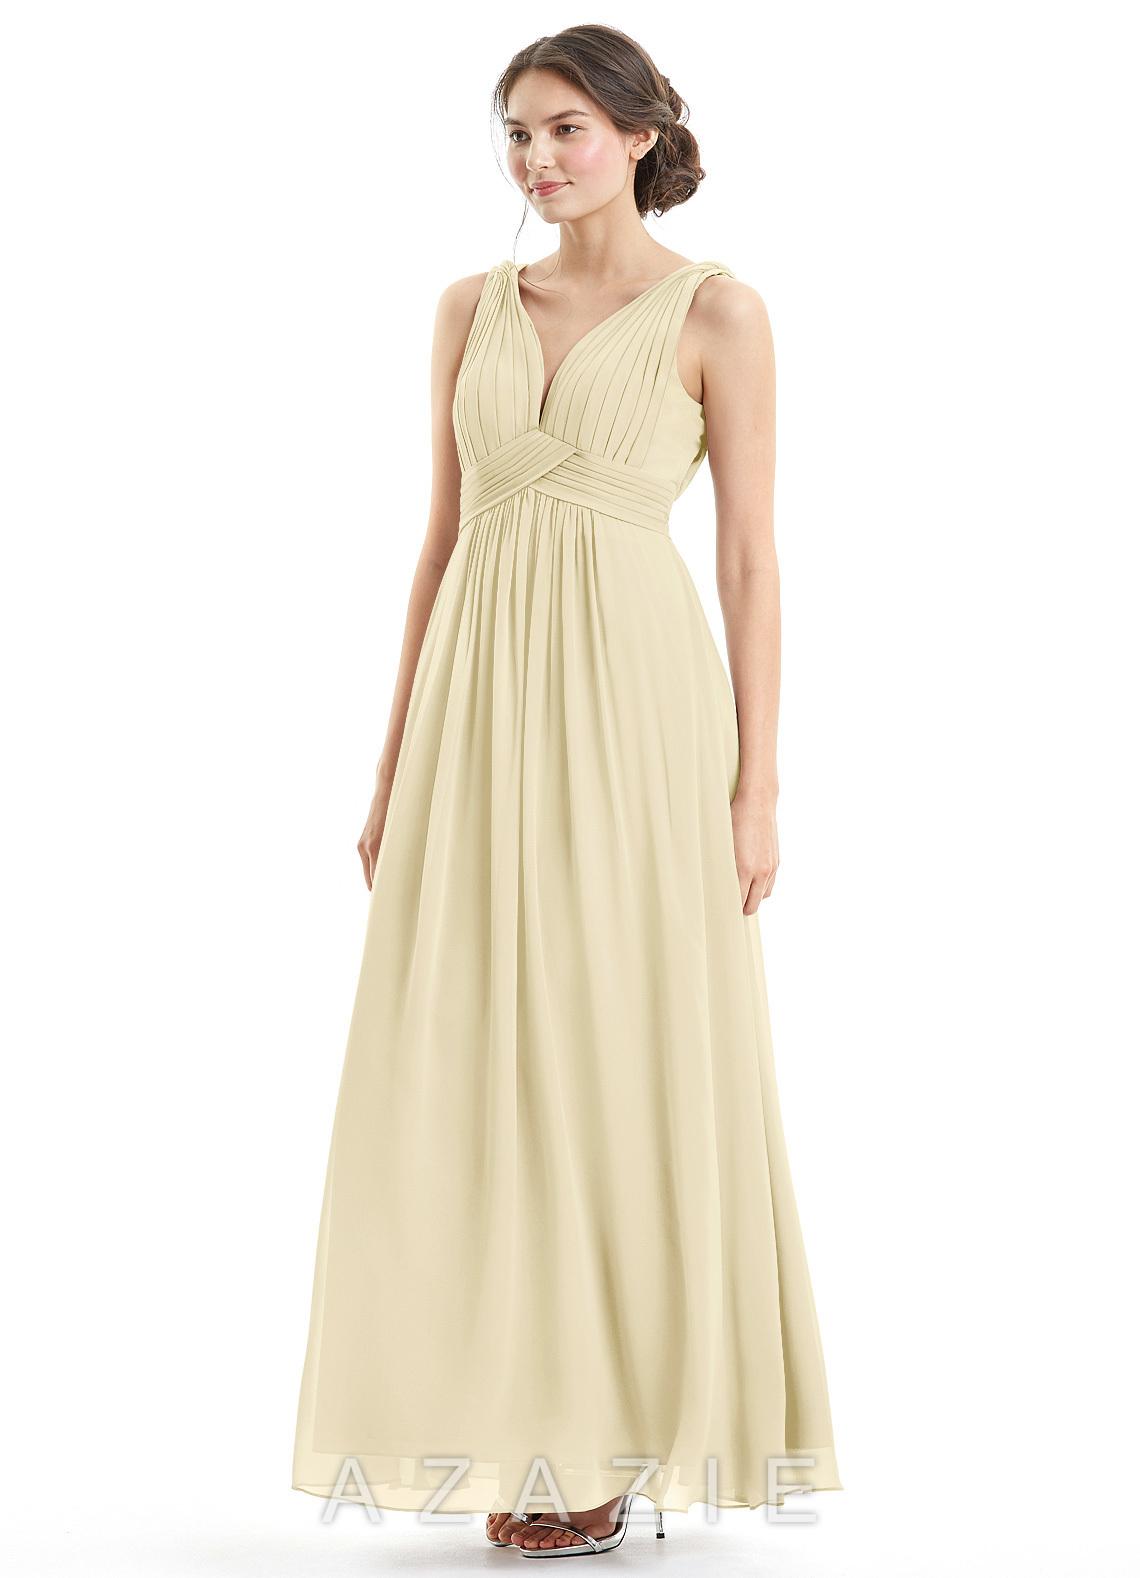 0e5263ba6f2 Azazie Hillary Bridesmaid Dress - Champagne